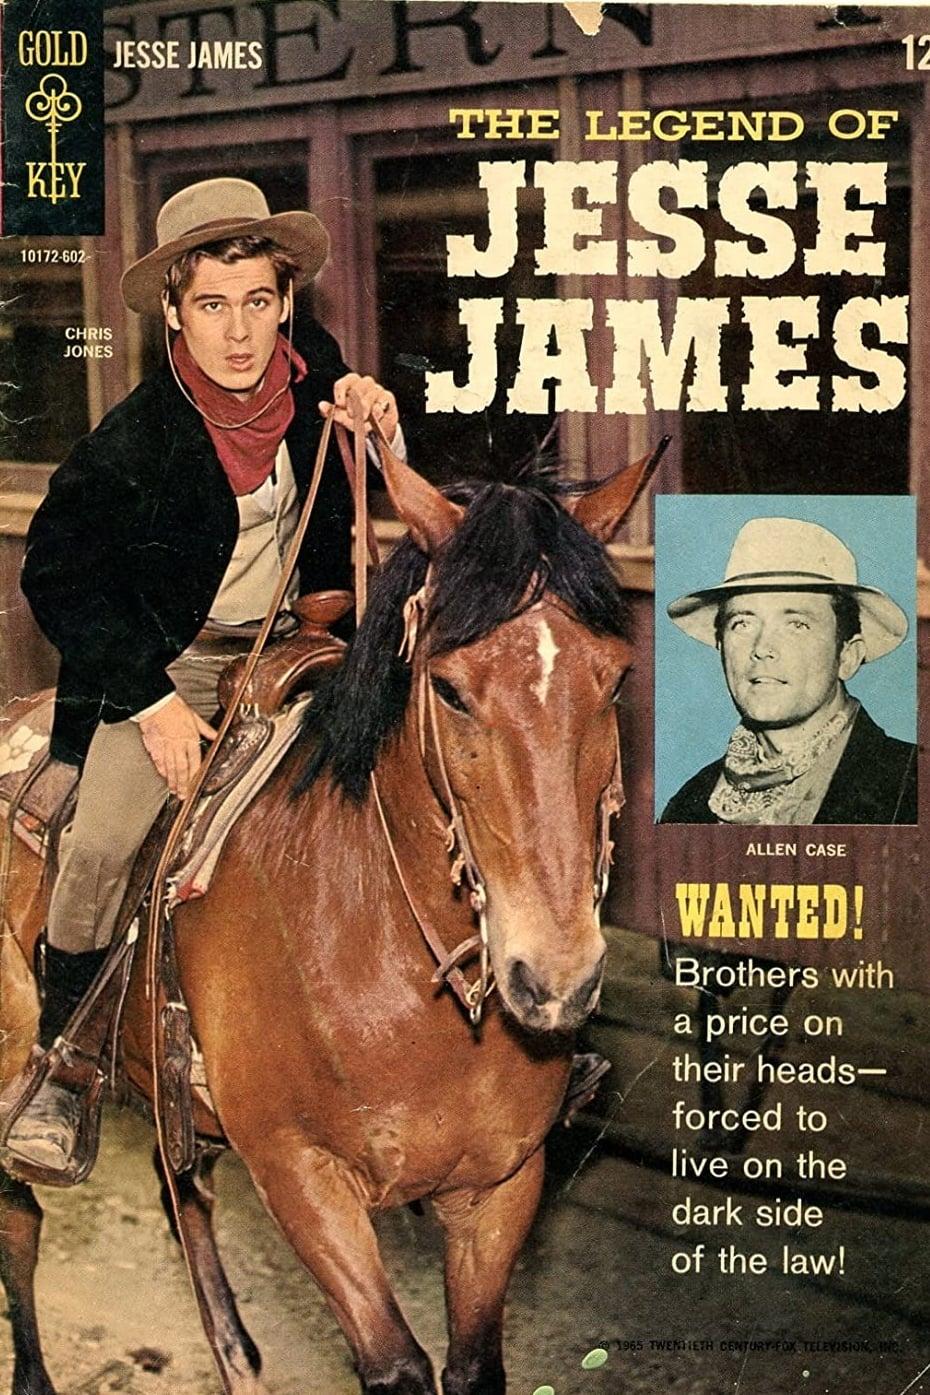 The Legend of Jesse James